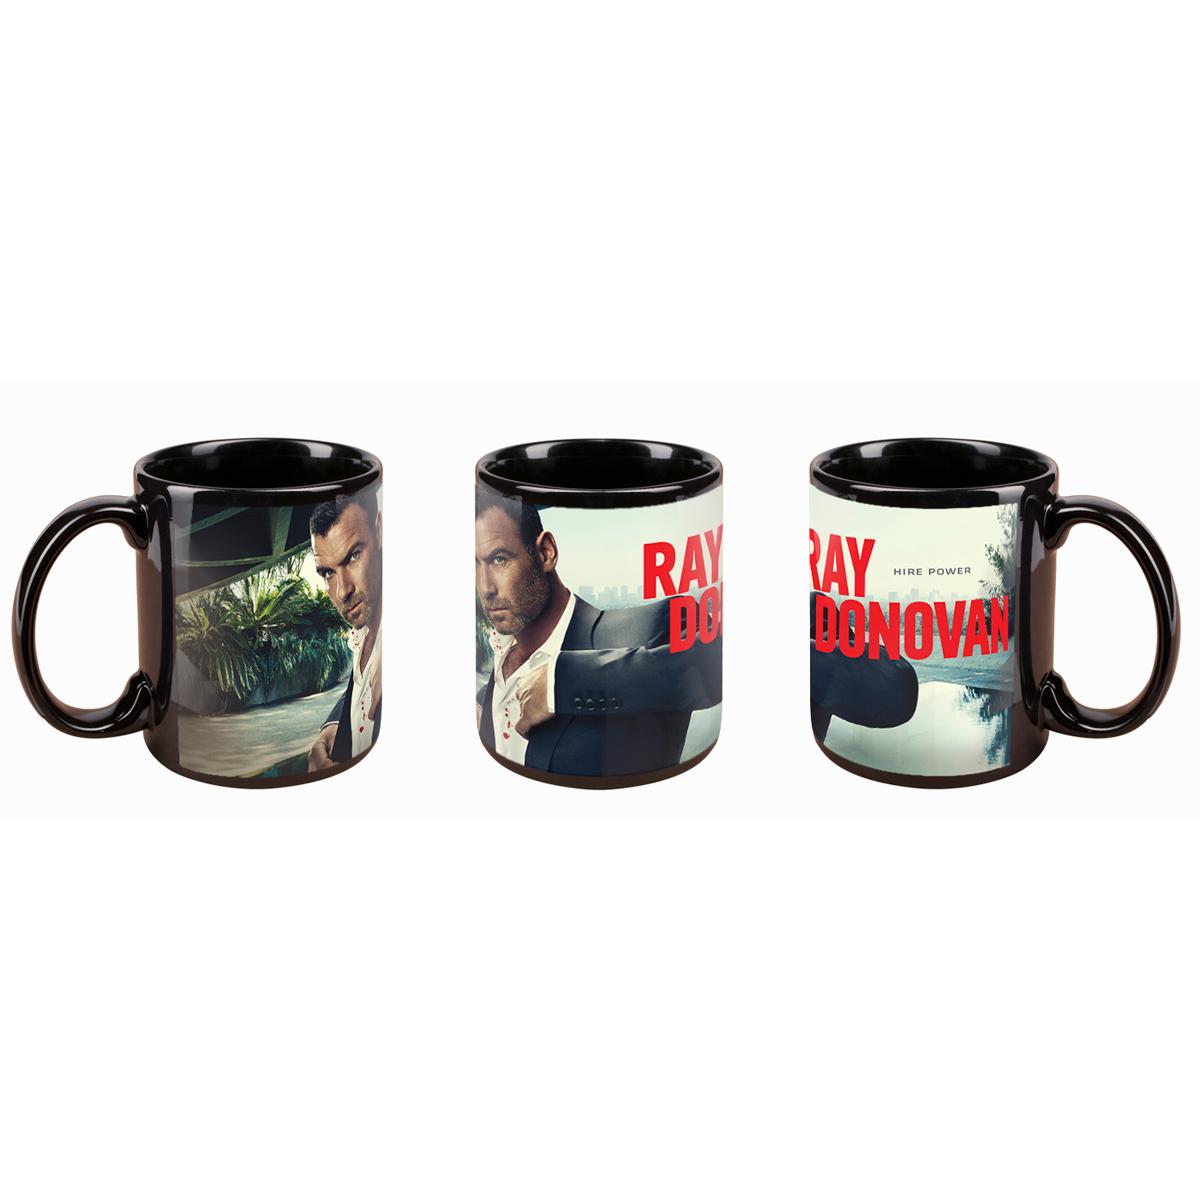 Ray Donovan Hire Power Mug